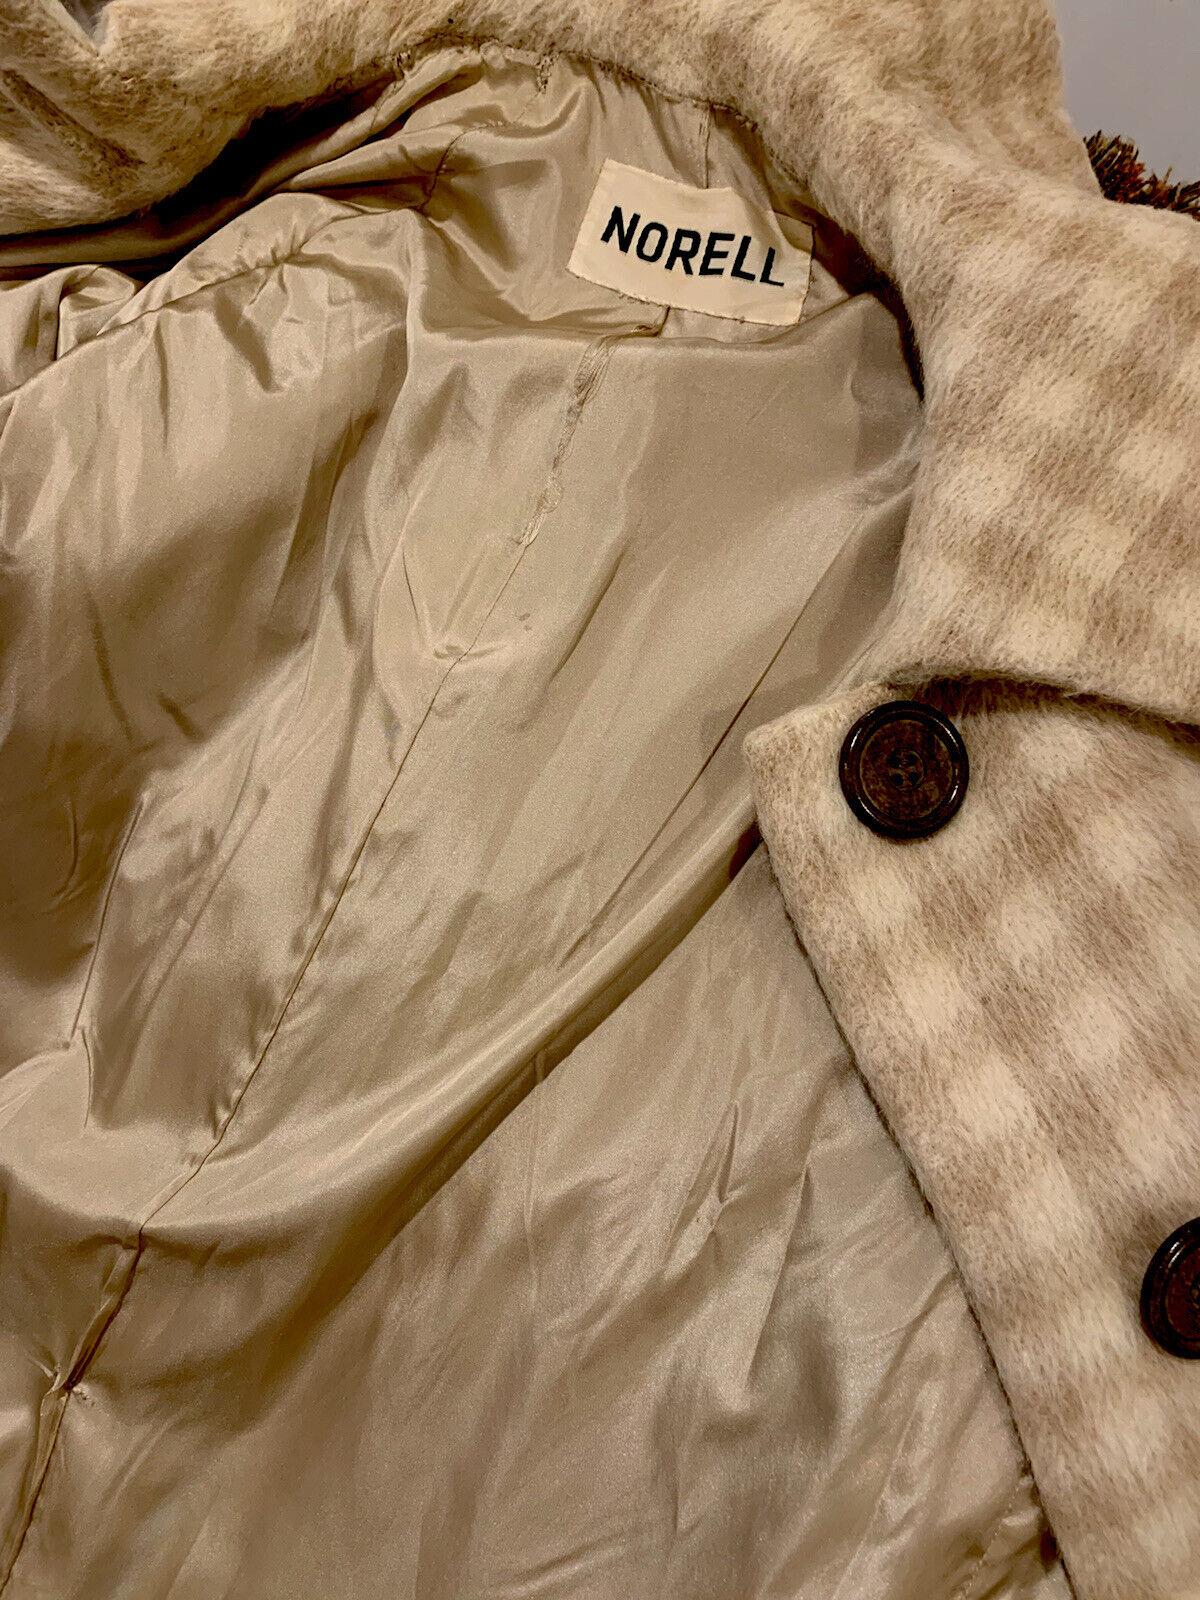 NORMAN NORELL Vtg Plaid Mohair Swing Coat Signatu… - image 7